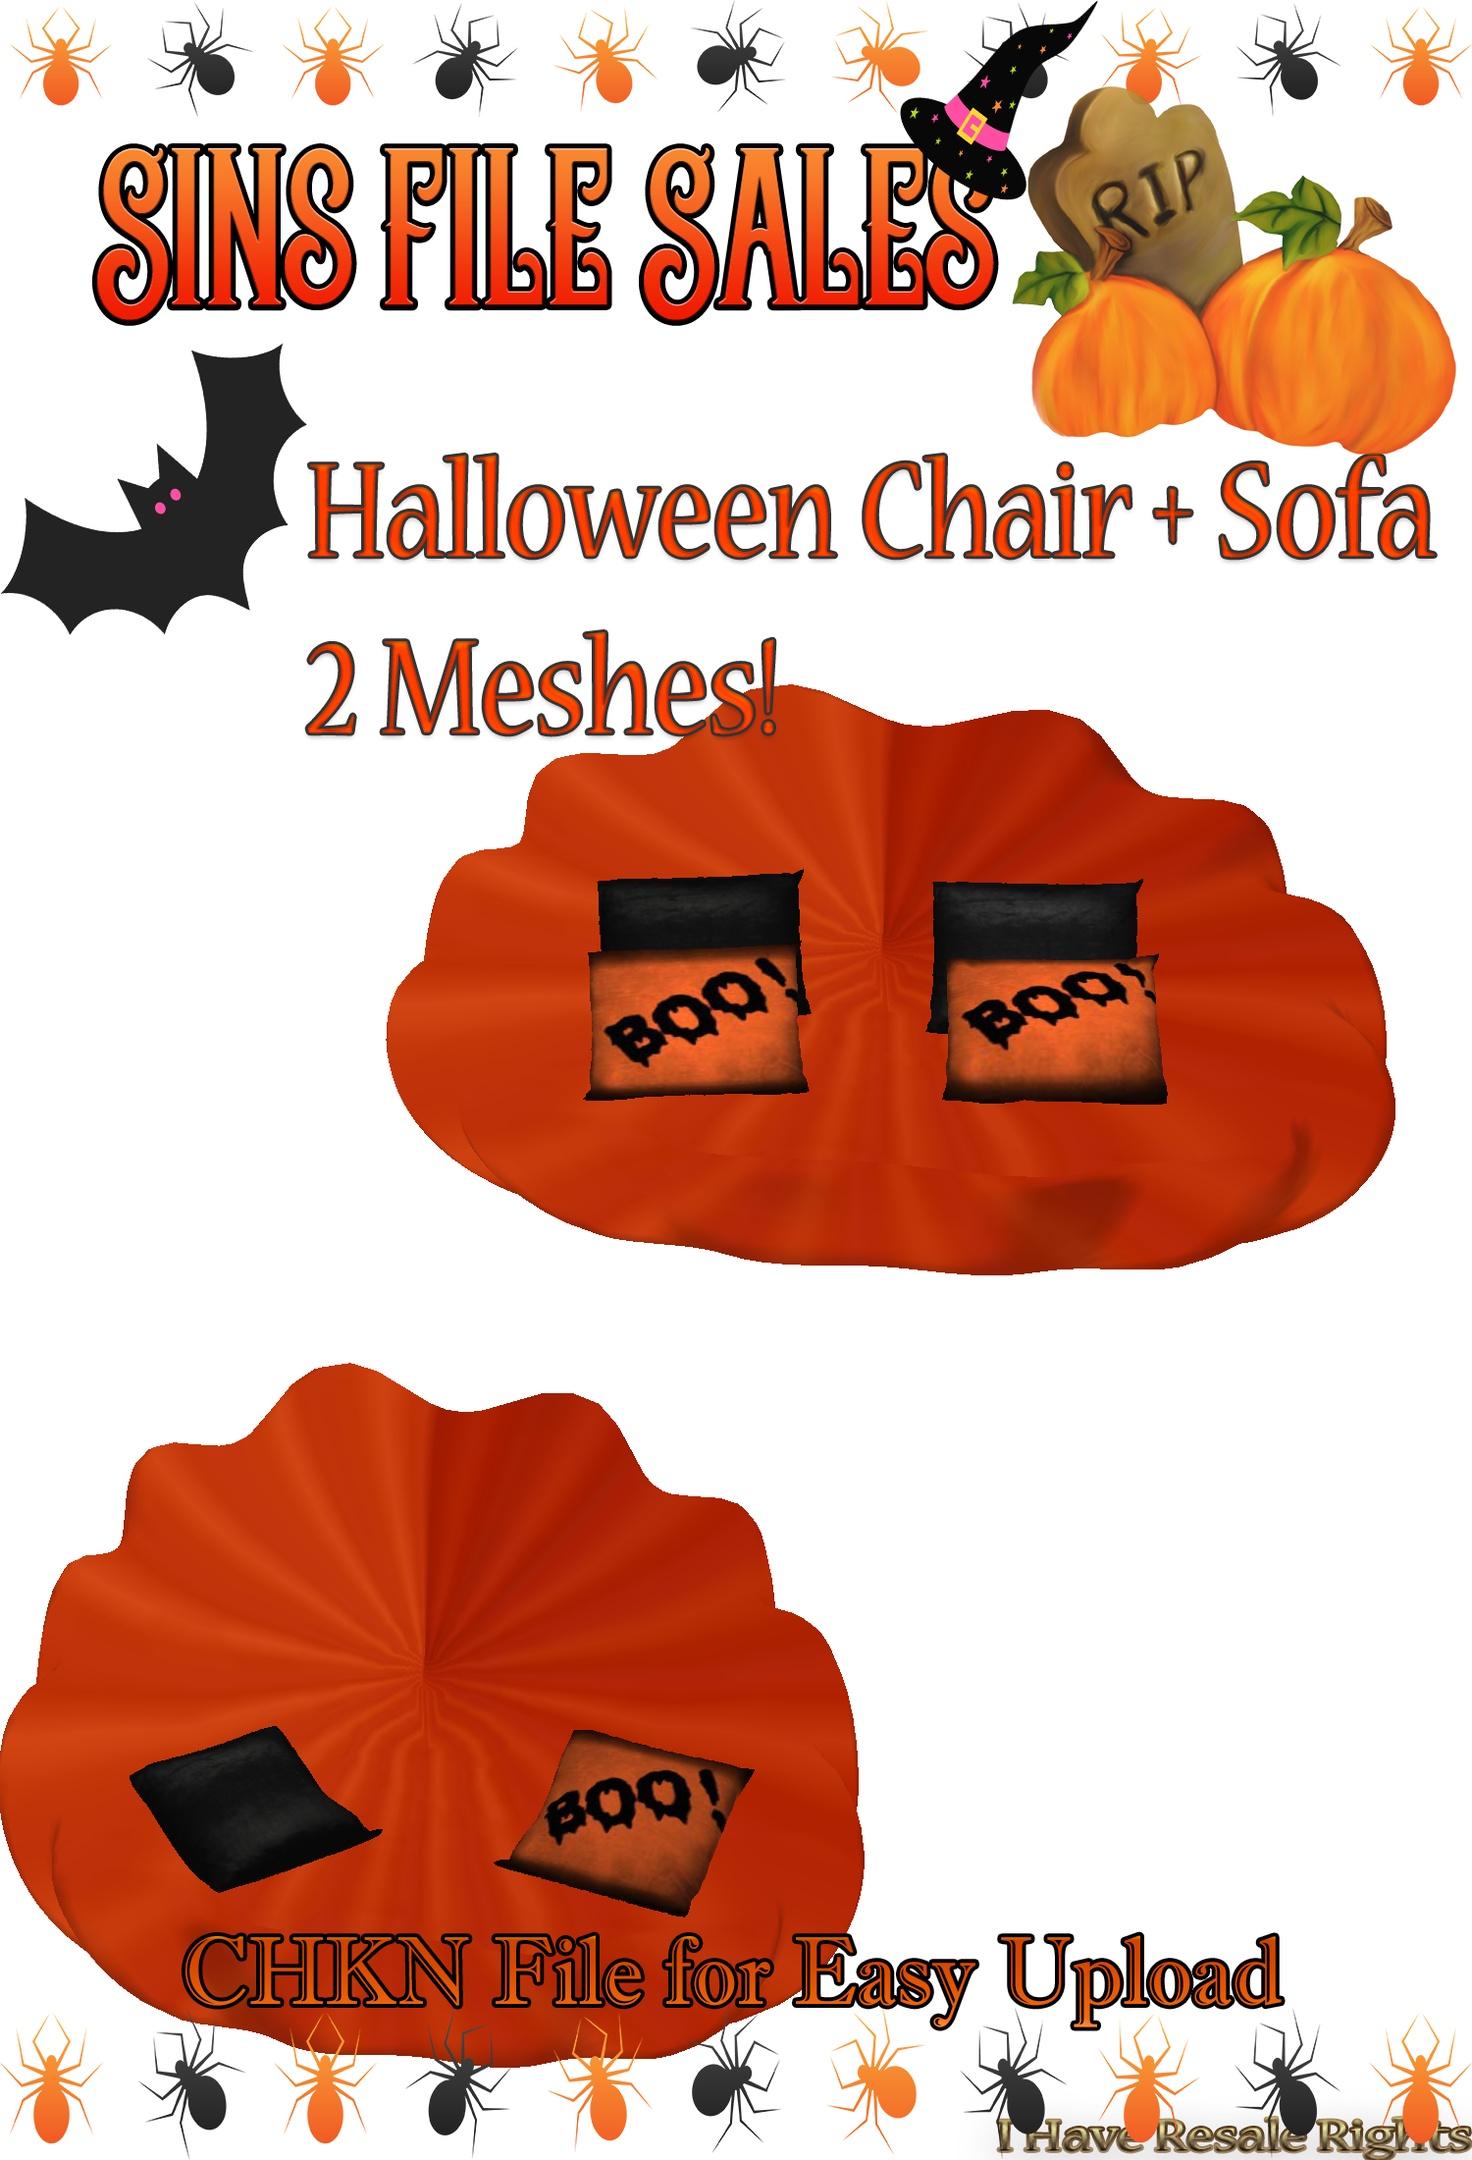 Halloween Sofa & Chair Set *2 Meshes